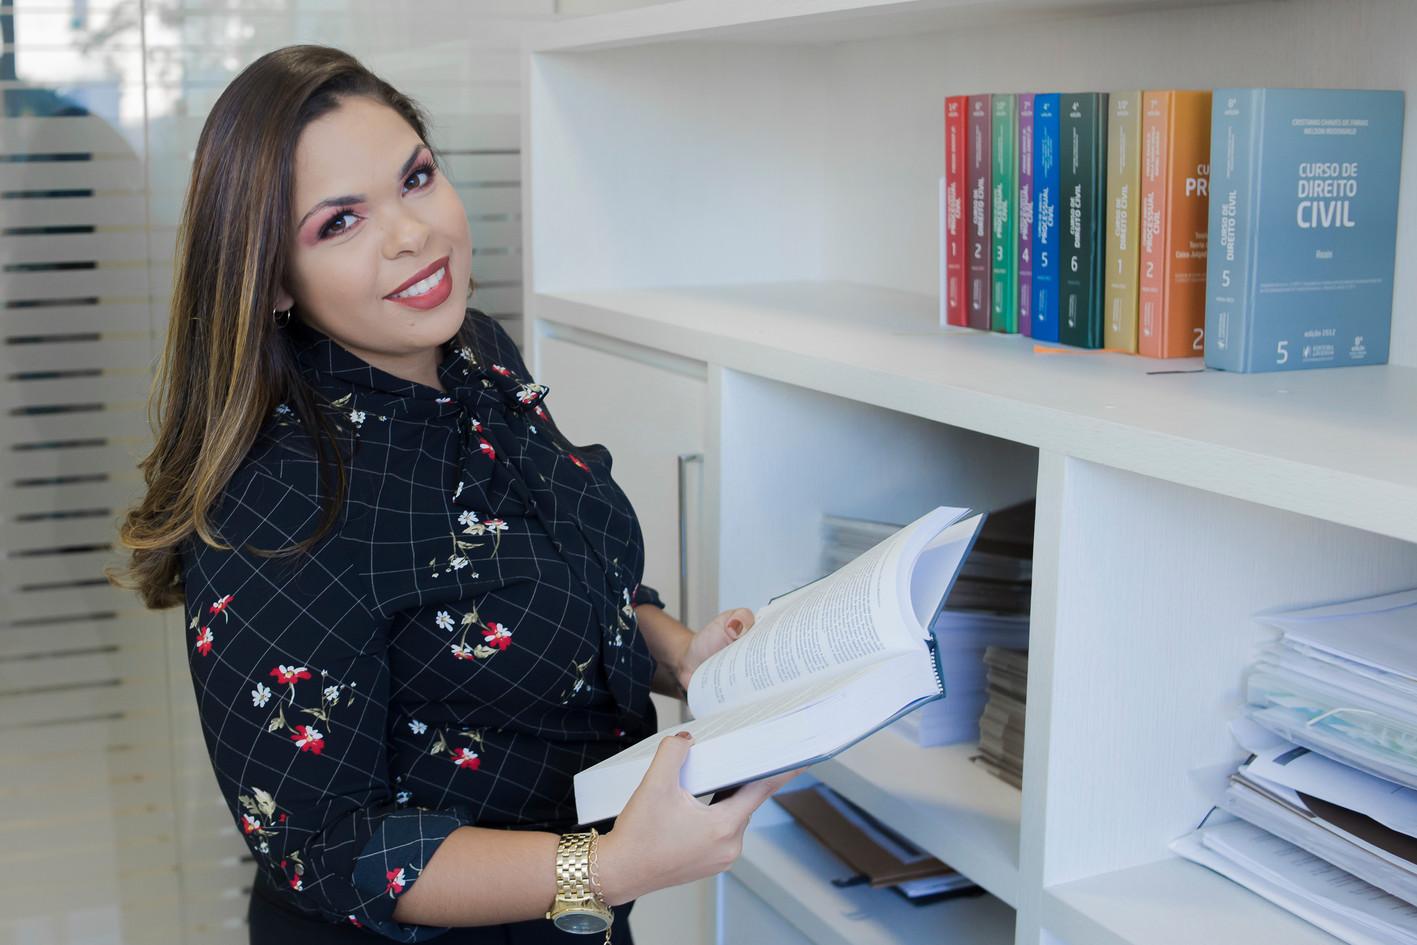 Dra. Beatriz Macedo